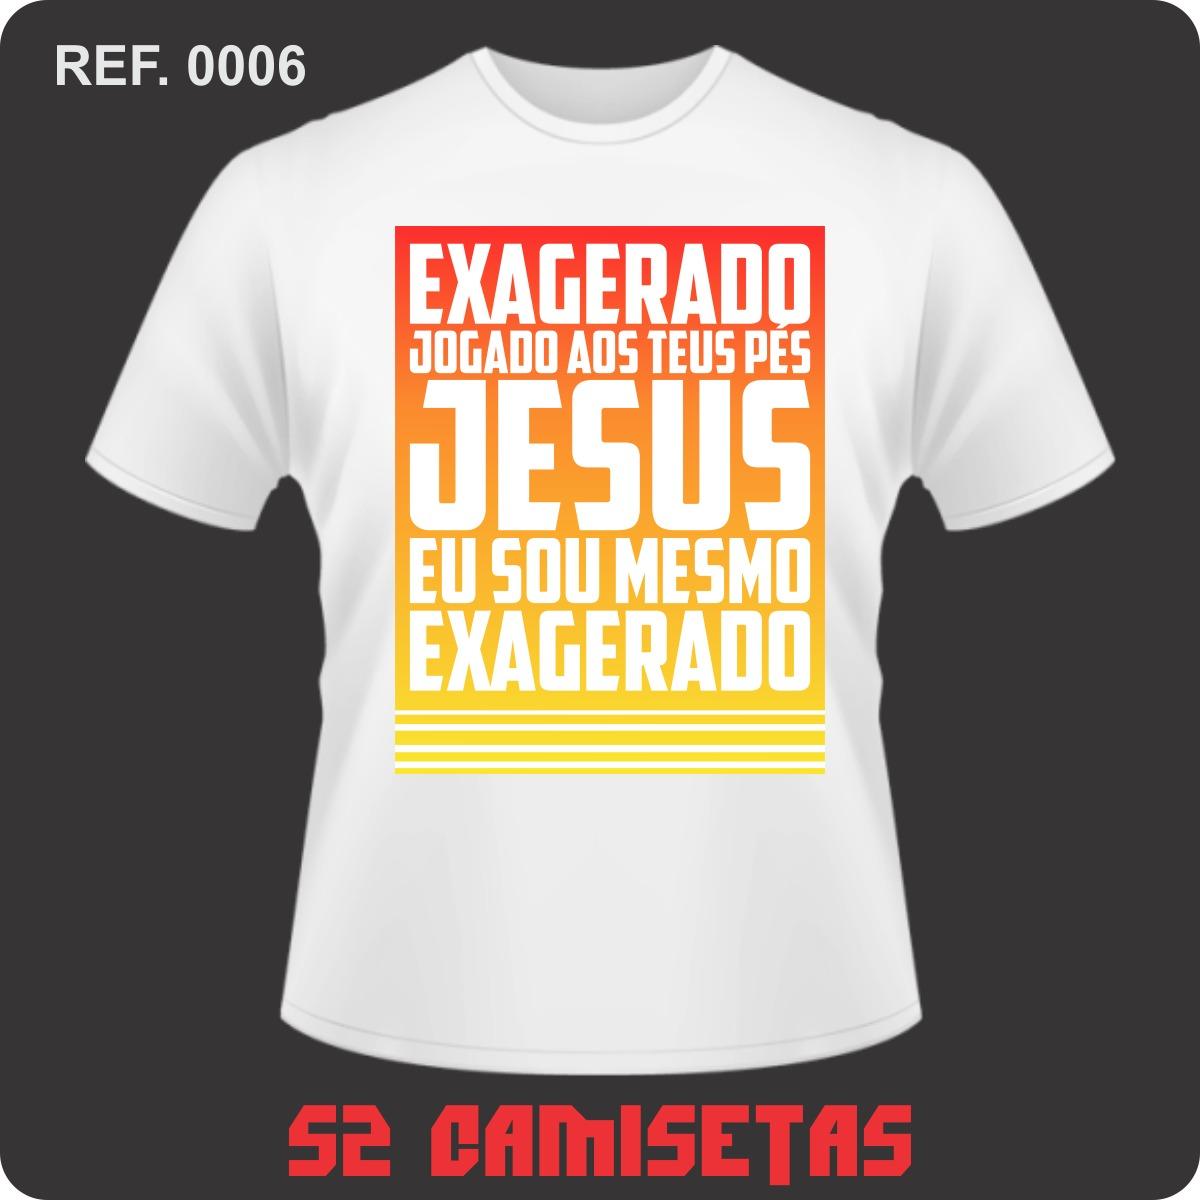 4f4ebd851 camisa camiseta personalizada jesus. Carregando zoom.